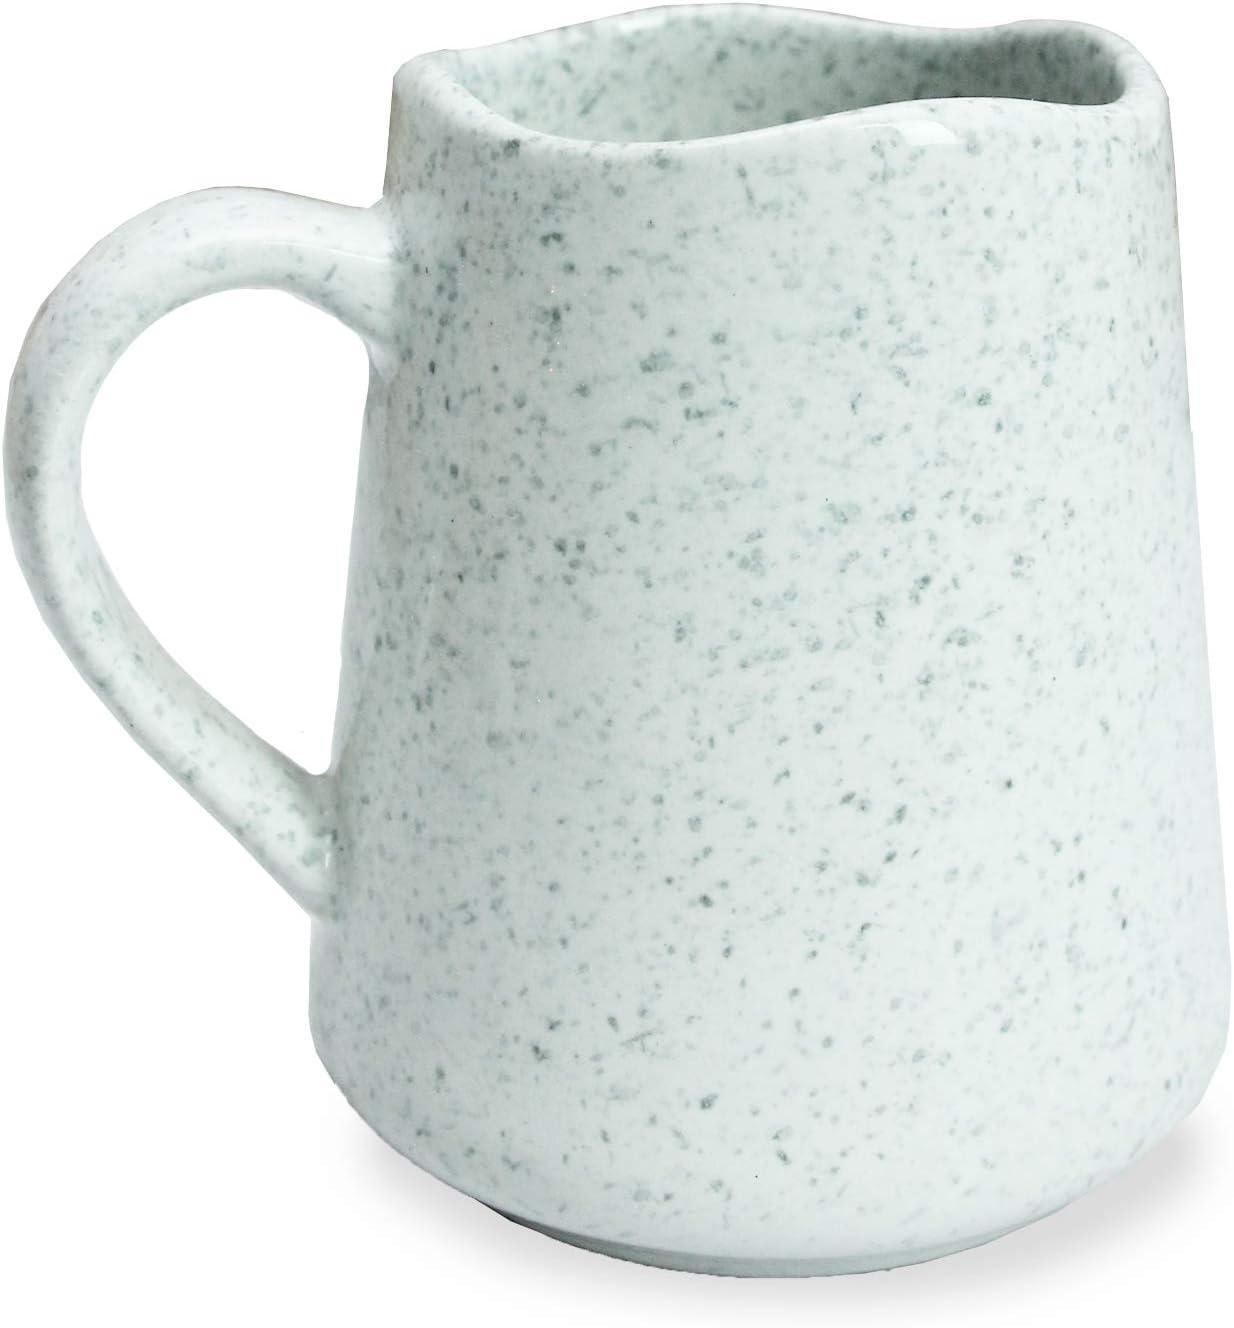 roro Cream White Ceramic Stoneware Speckled Spotted Coffee and Tea Mug, 12 oz cup